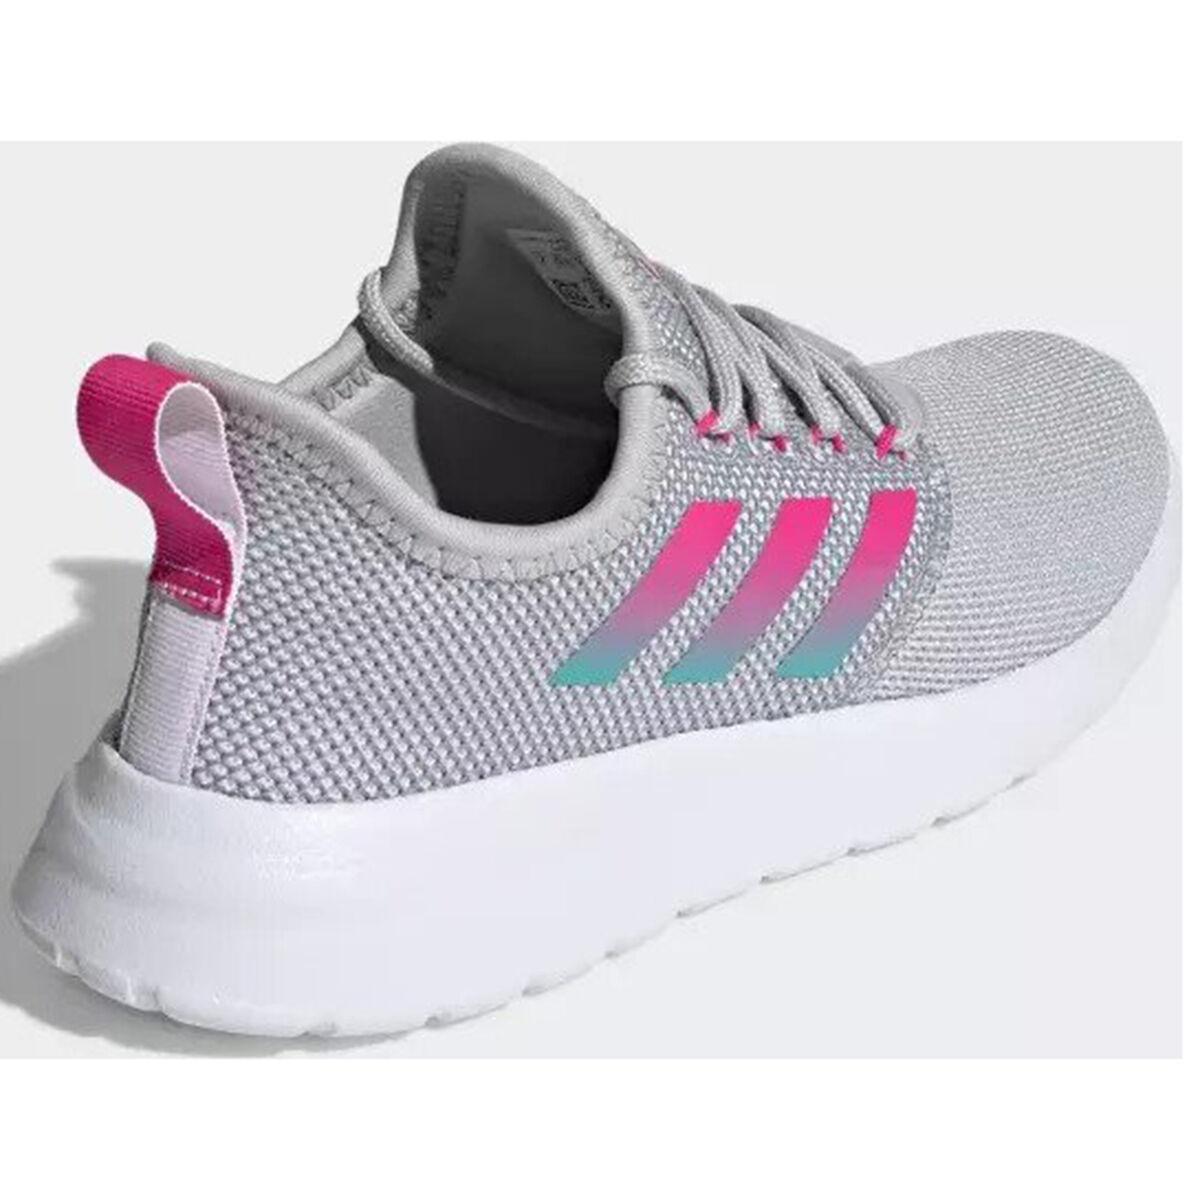 Zapatilla Mujer Adidas Lite Racer Rbn